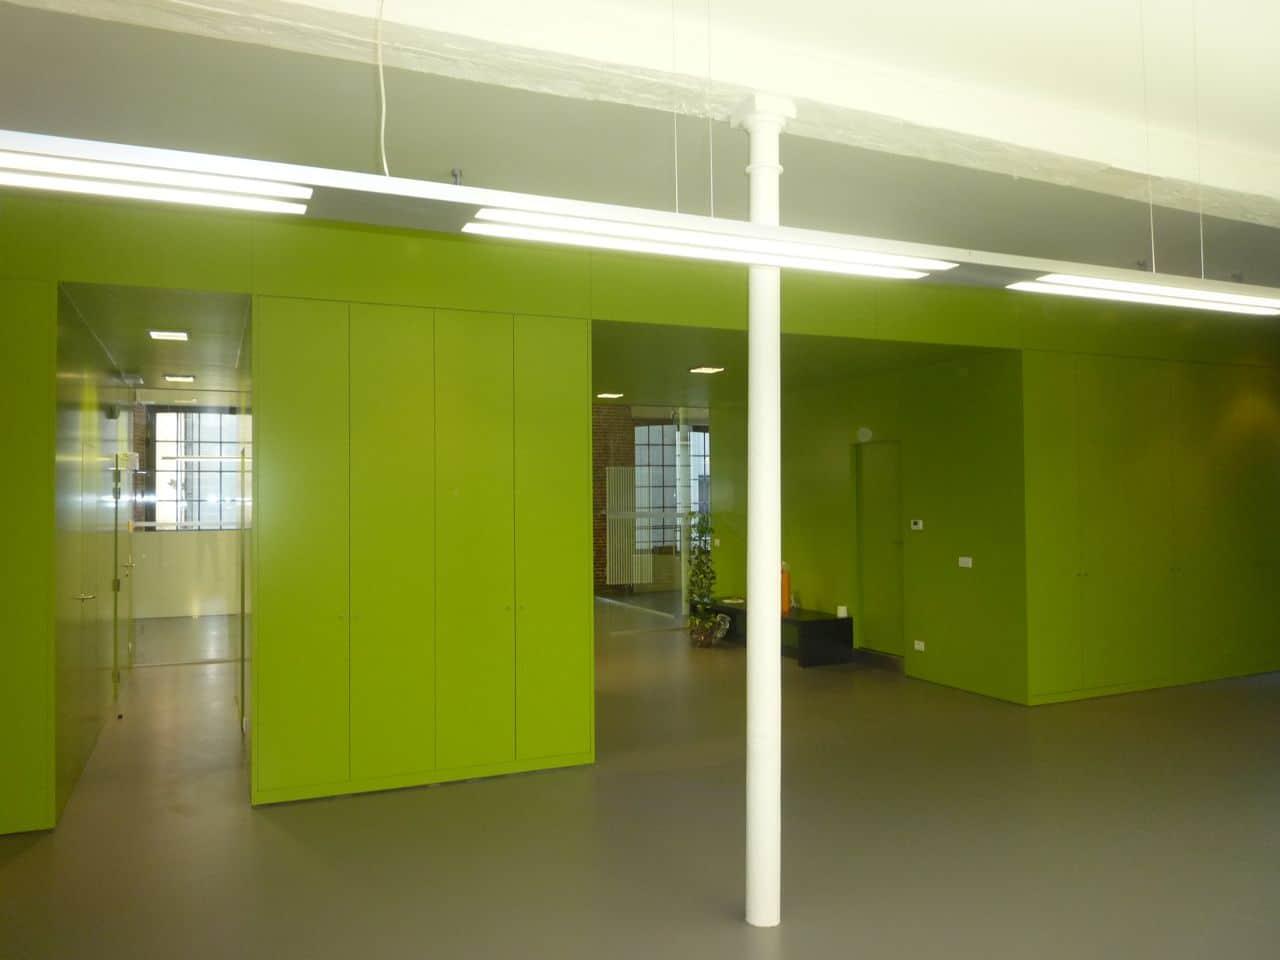 P1060766 | Baeyens & Beck architecten Gent | architect nieuwbouw renovatie interieur | high end | architectenbureau